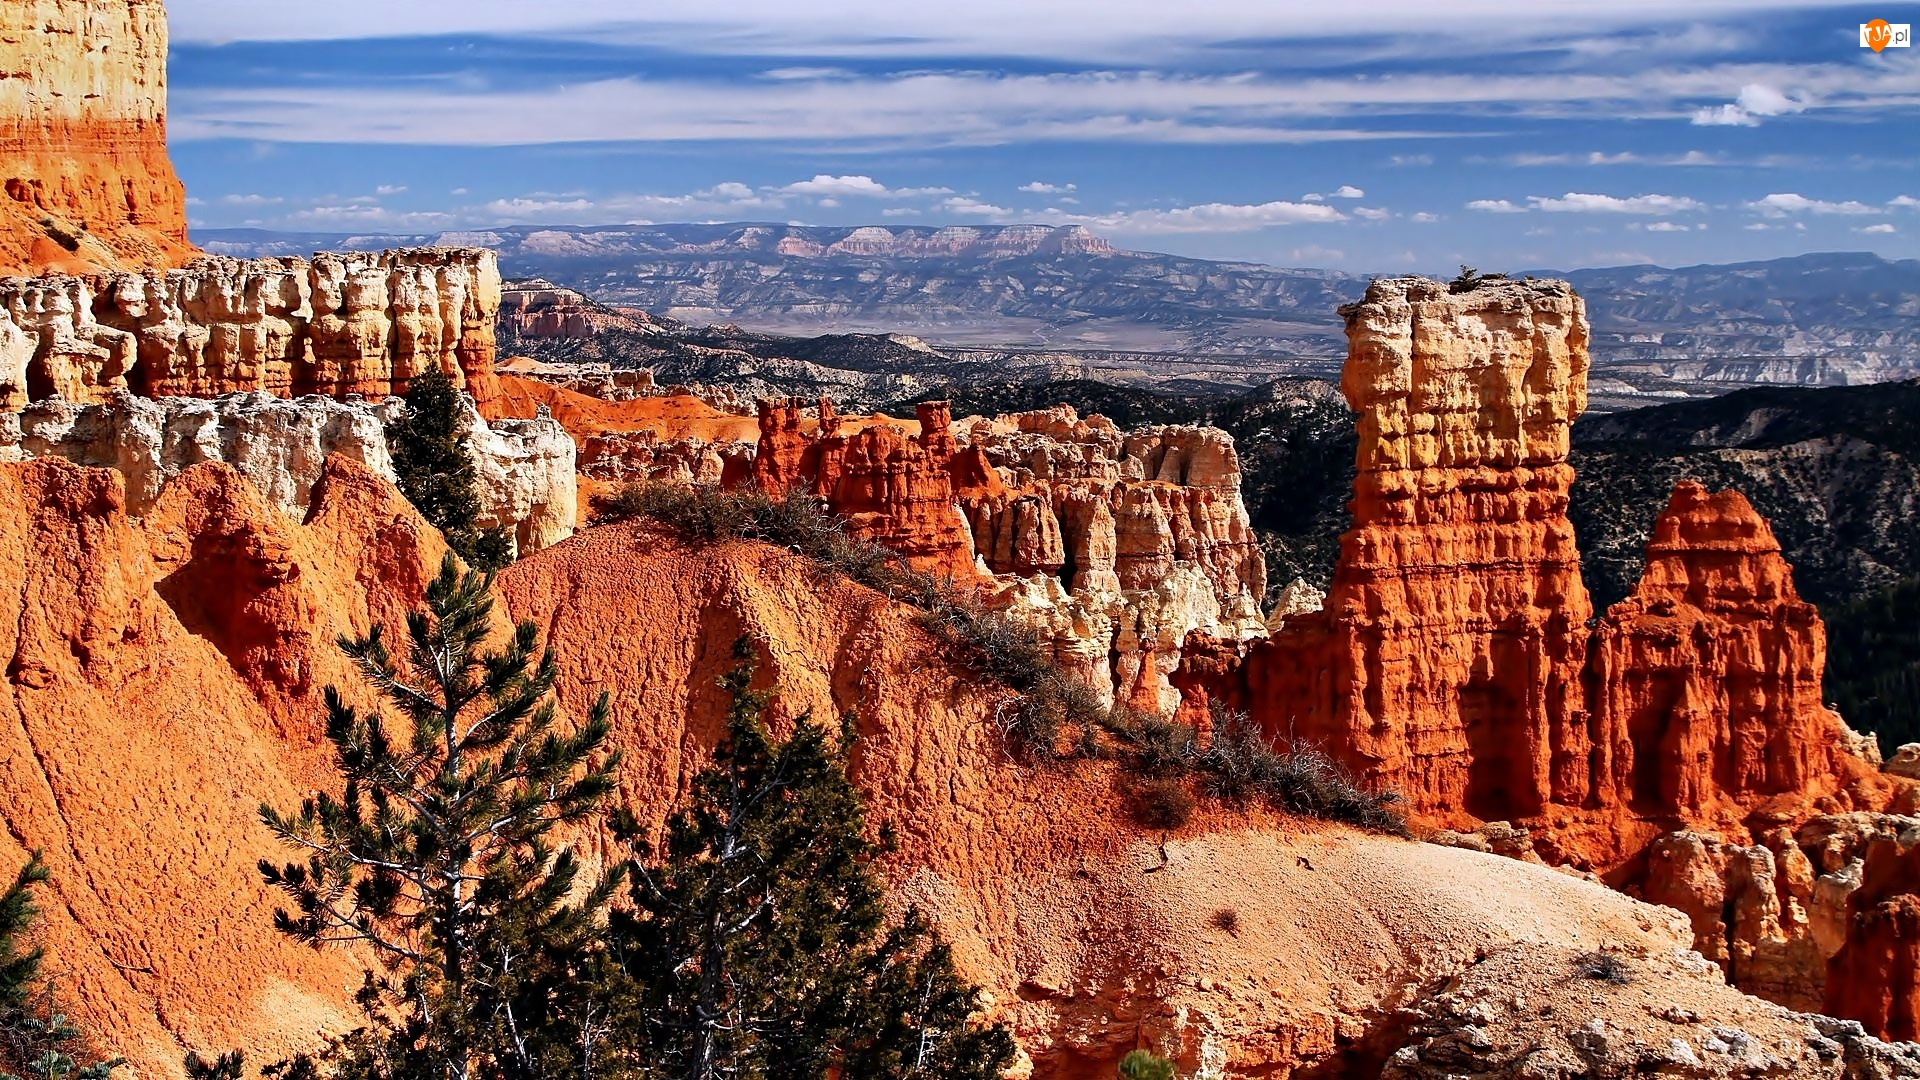 Stany Zjednoczone, Kanion, Stan Utah, Park Narodowy Bryce Canyon